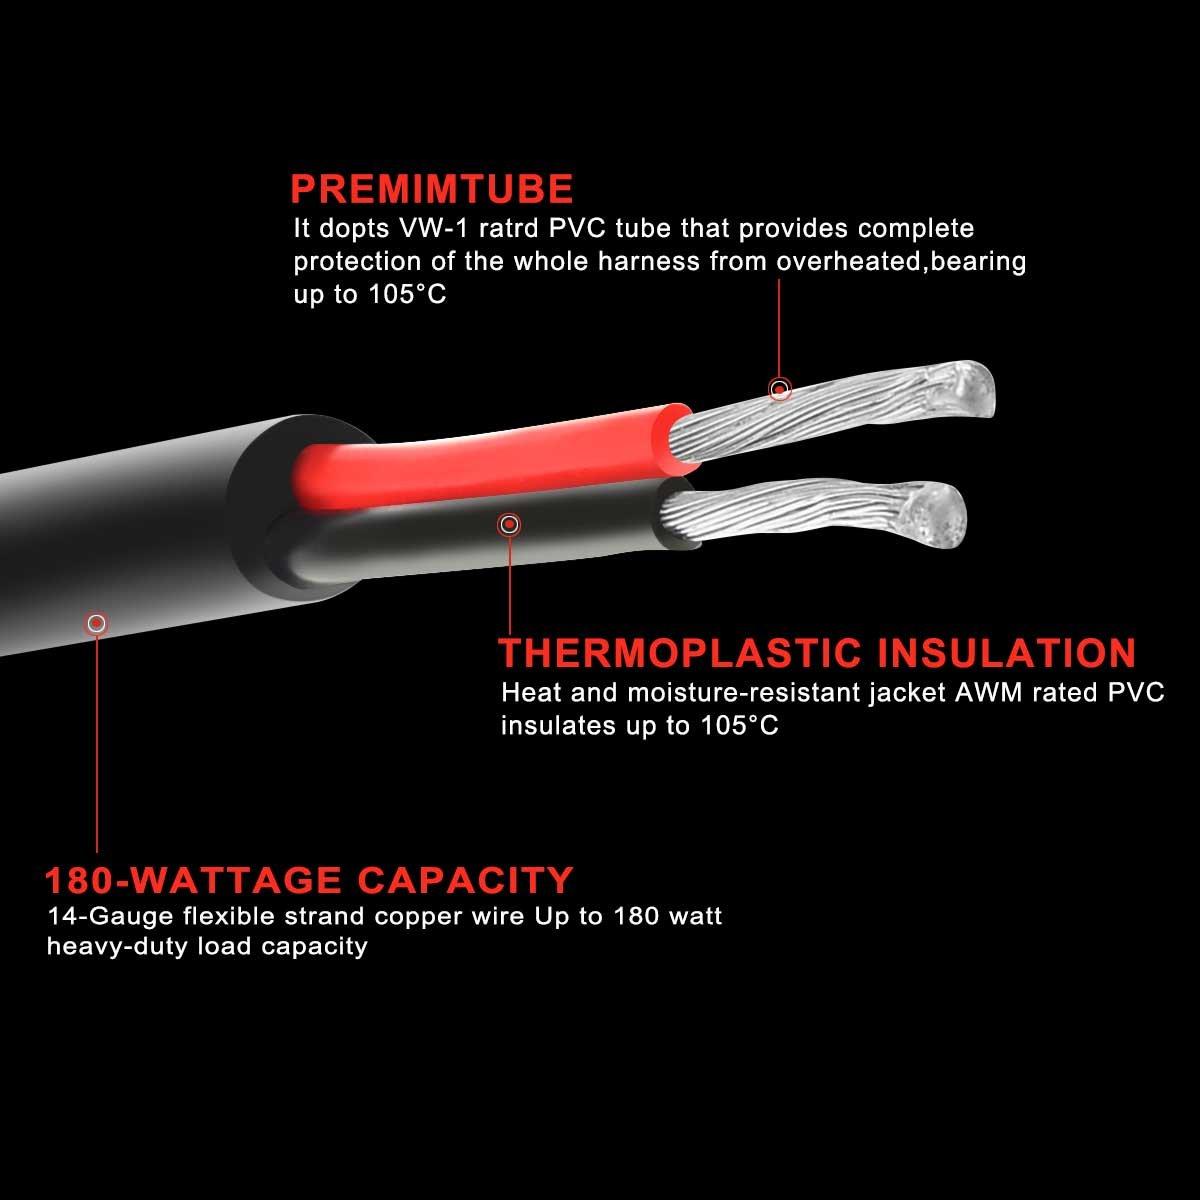 Kawell Universal 2 Lead Off Road Atv Led Light Bar Wiring Harness Kit For 40 Amp